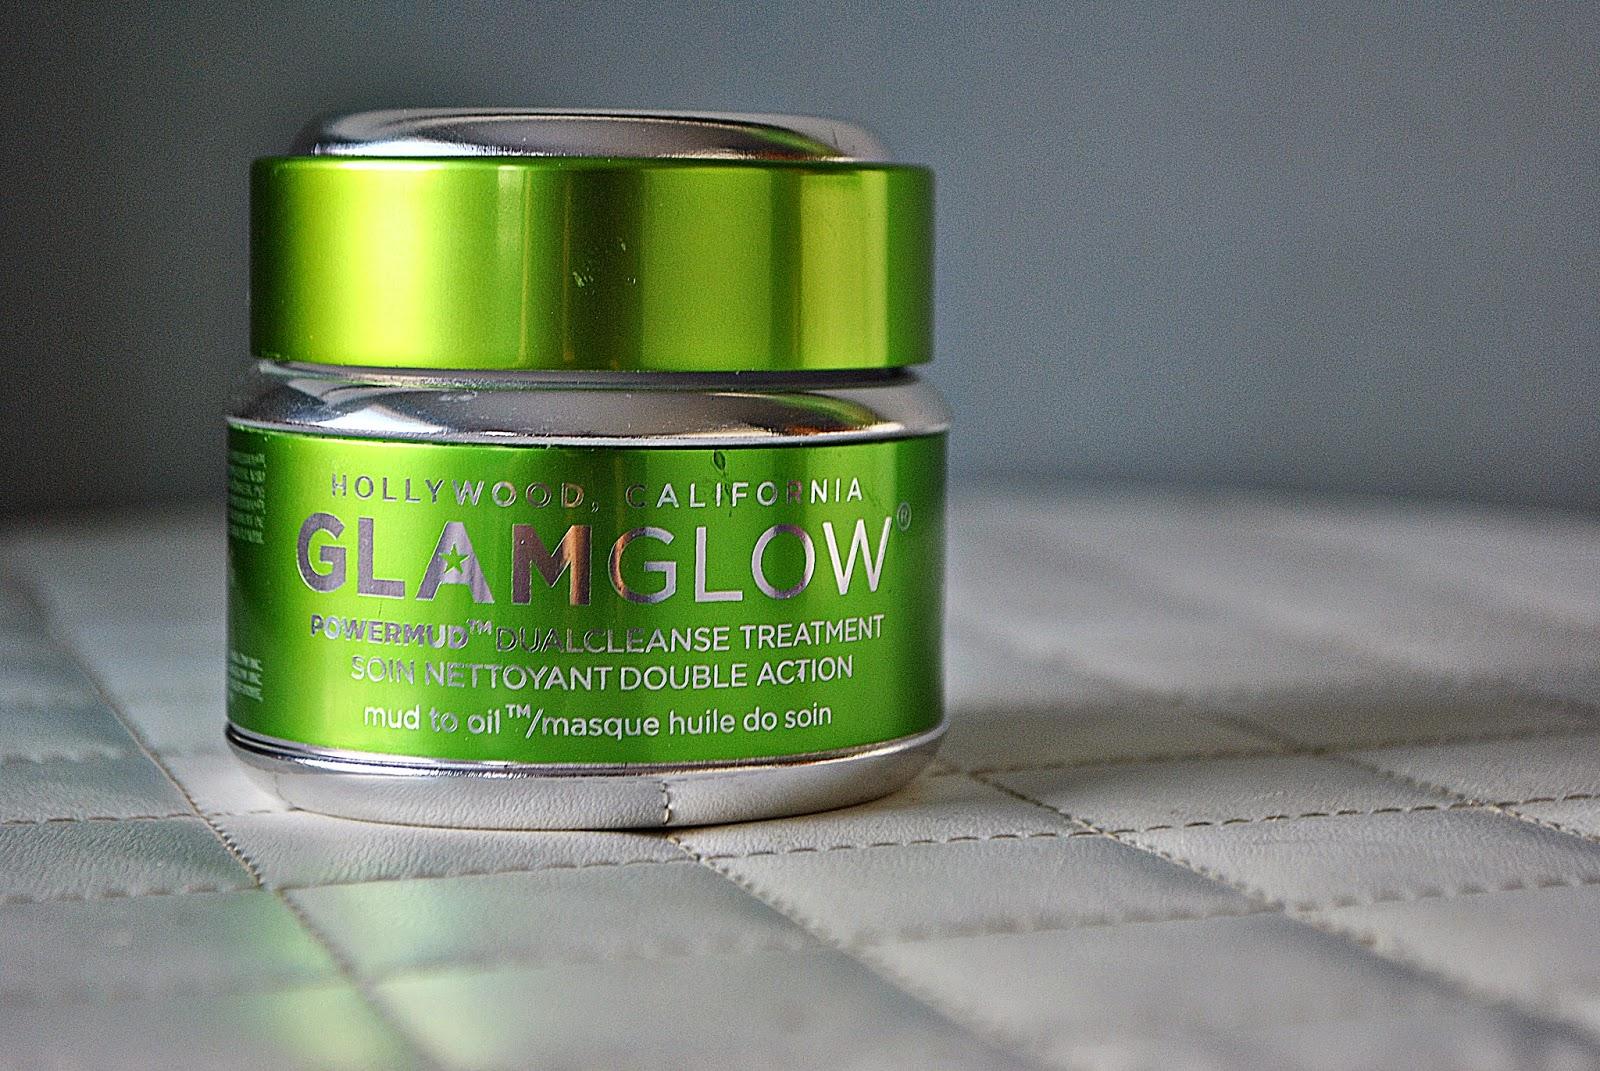 GLAM GLOW POWDER MUD DUAL CLEANSE TREATMENT